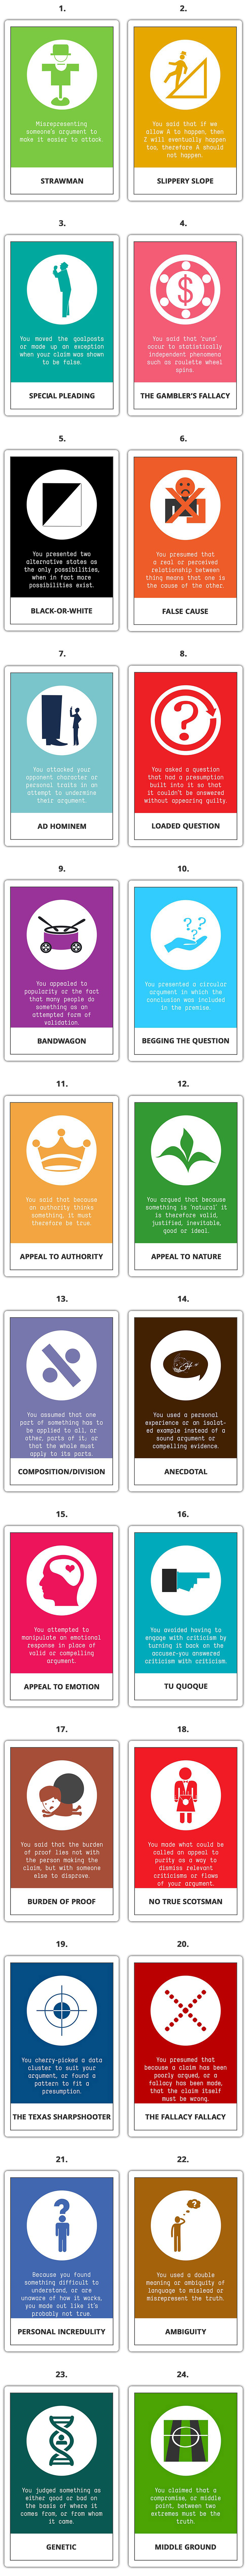 24-logical-fallacies-reasoning-mistakes-we-make-main